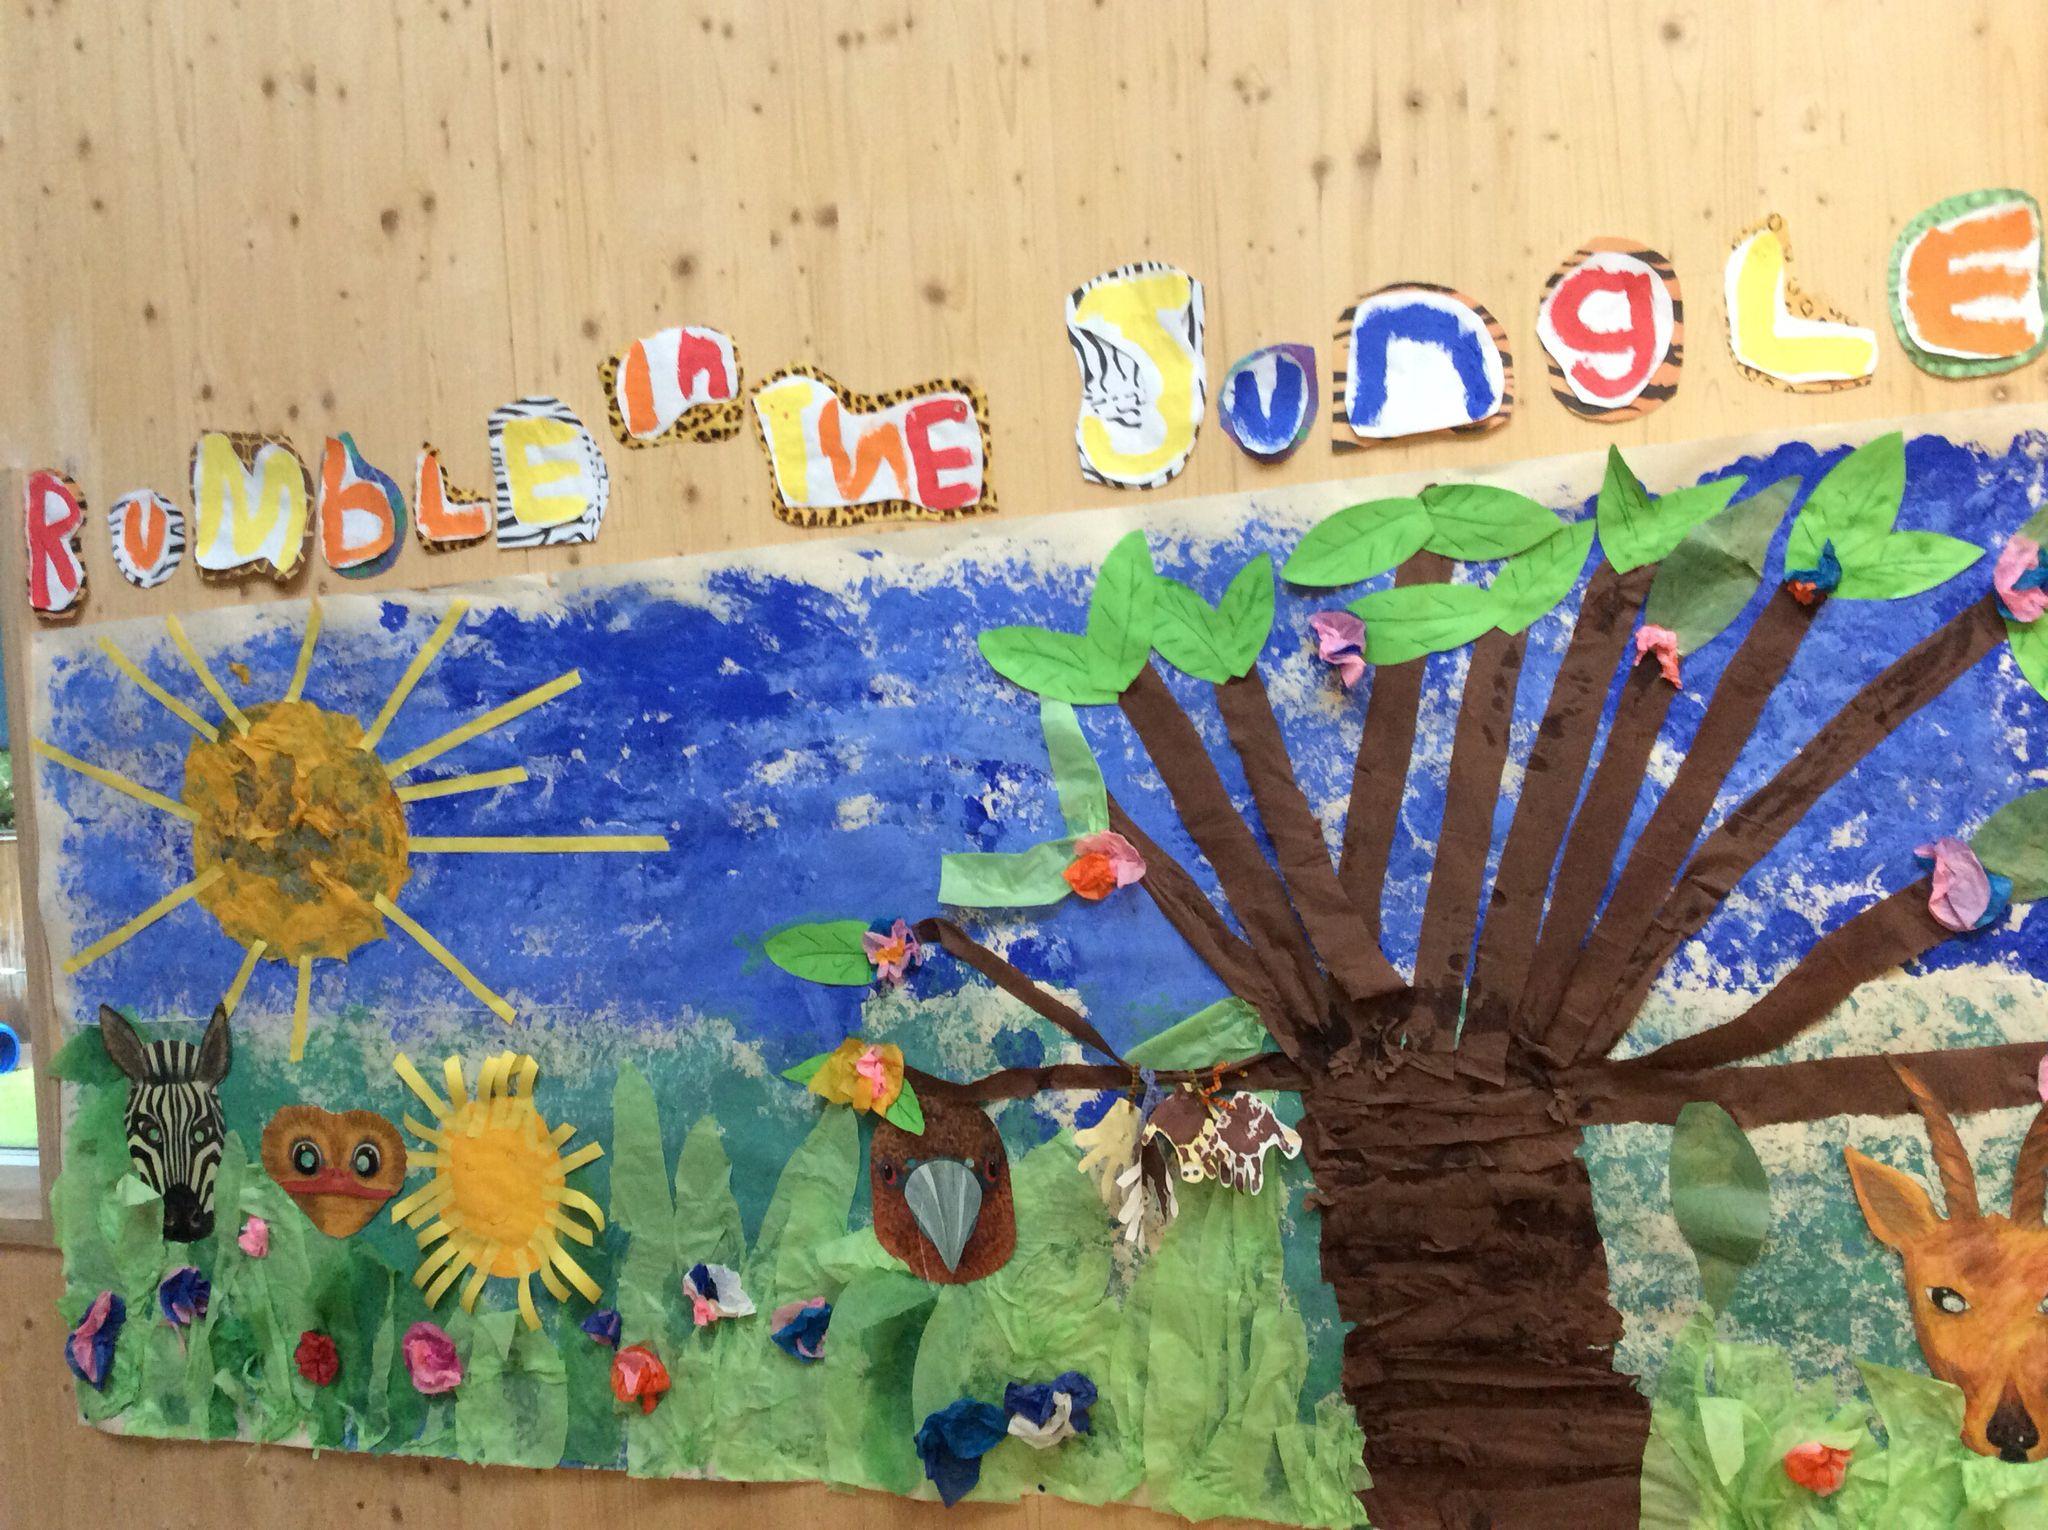 #Display #Jungle #Preschool #Children #Art #Edinburgh